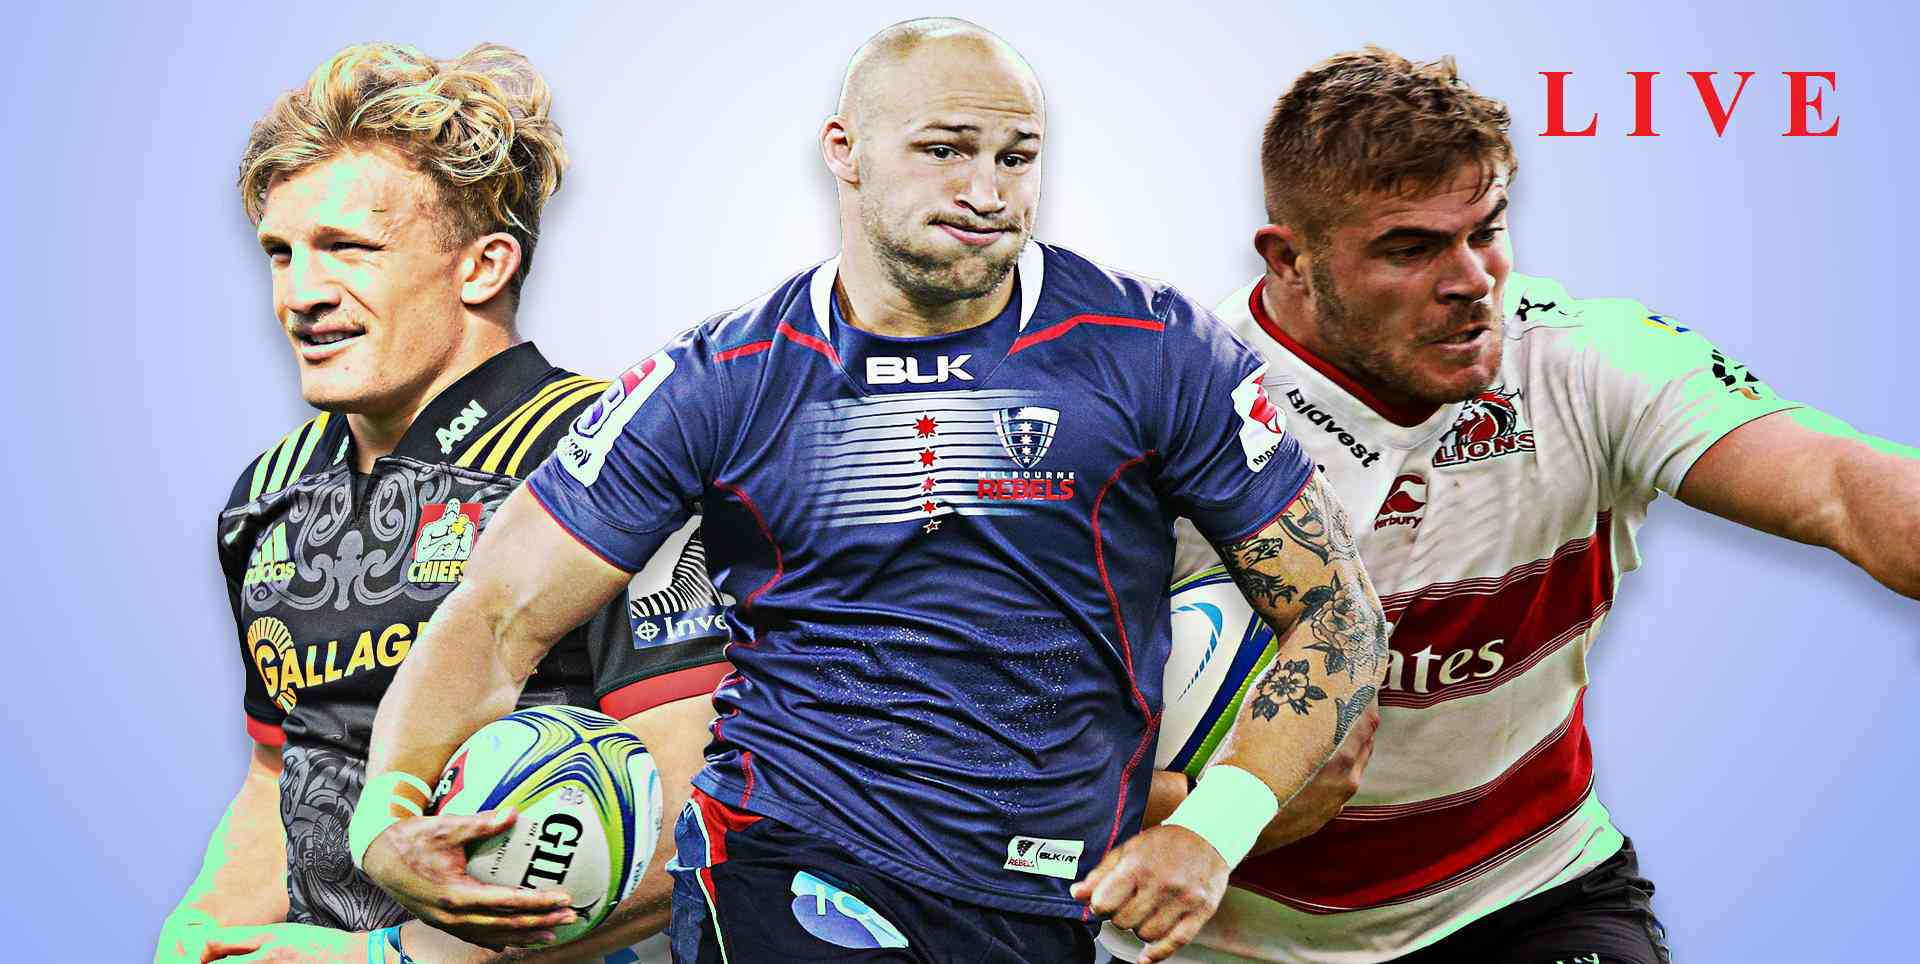 live-stade-francais-vs-gloucester-rugby-final-online